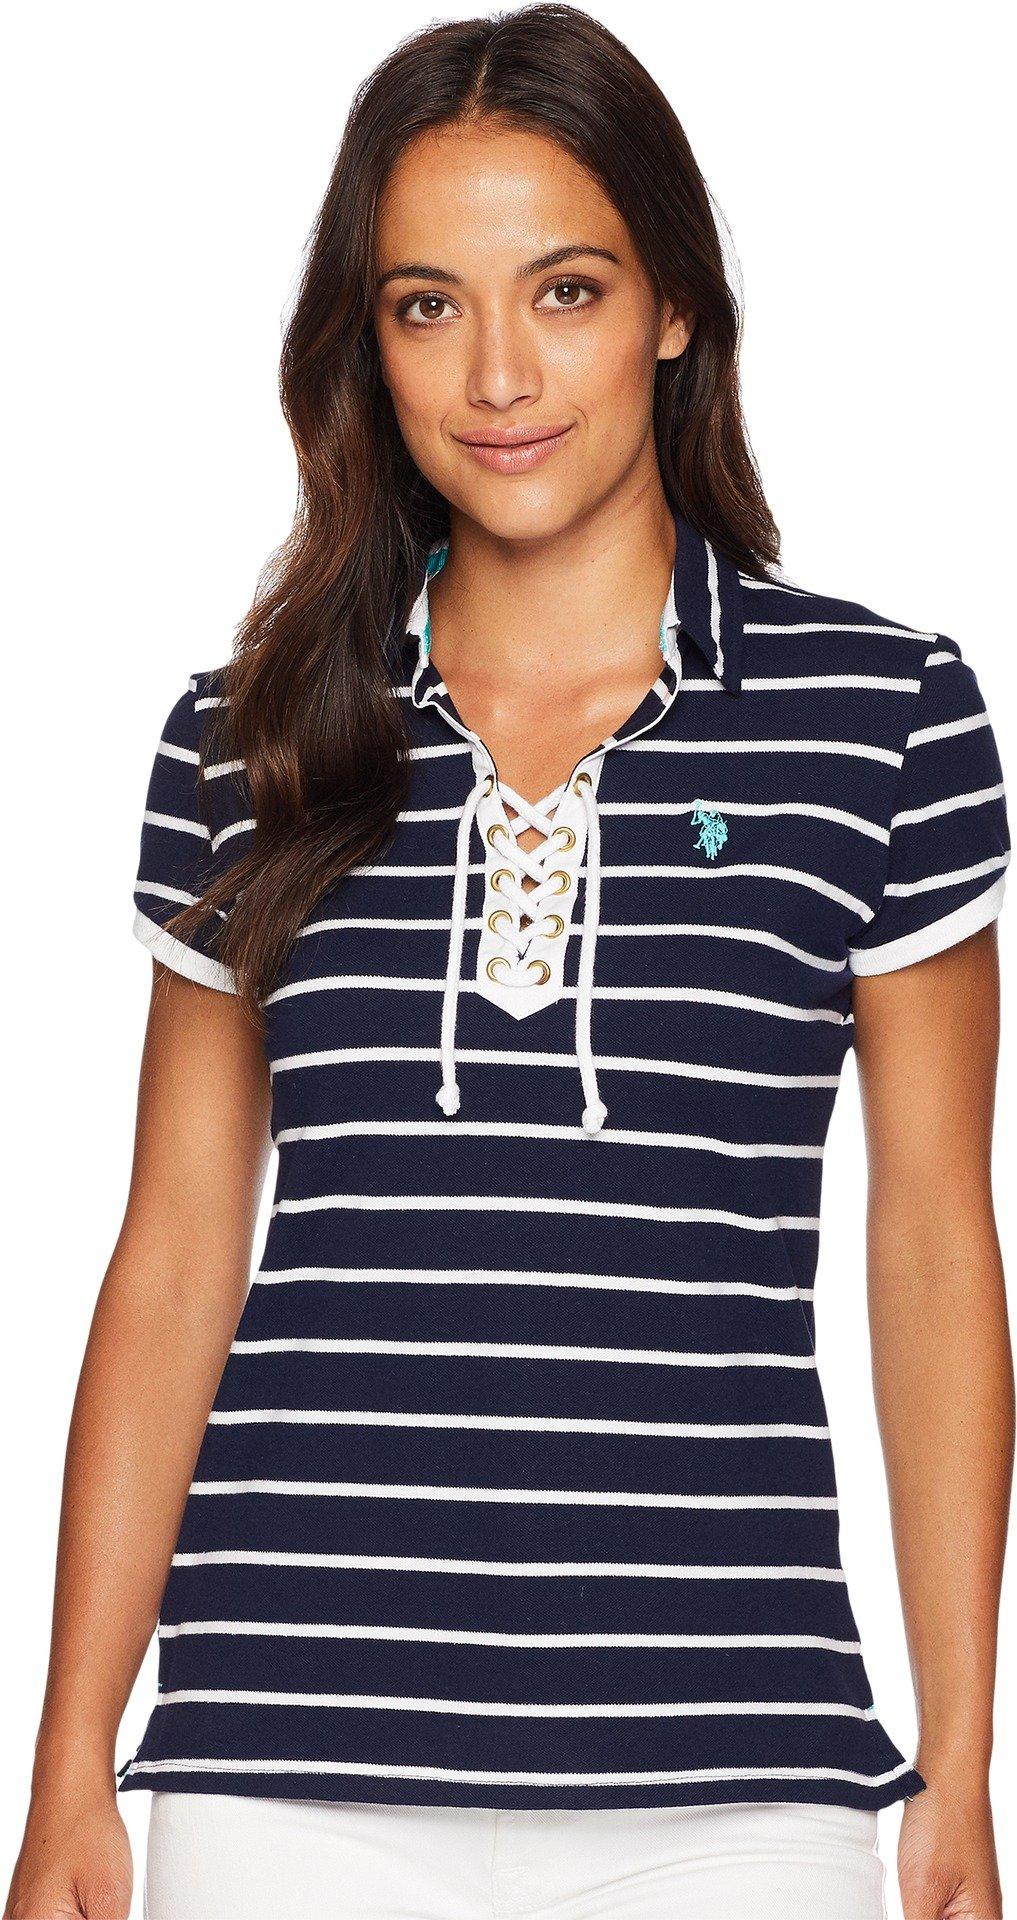 U.S. Polo Assn. Women's Laceup Striped Pique Shirt, Tribal Navy, M